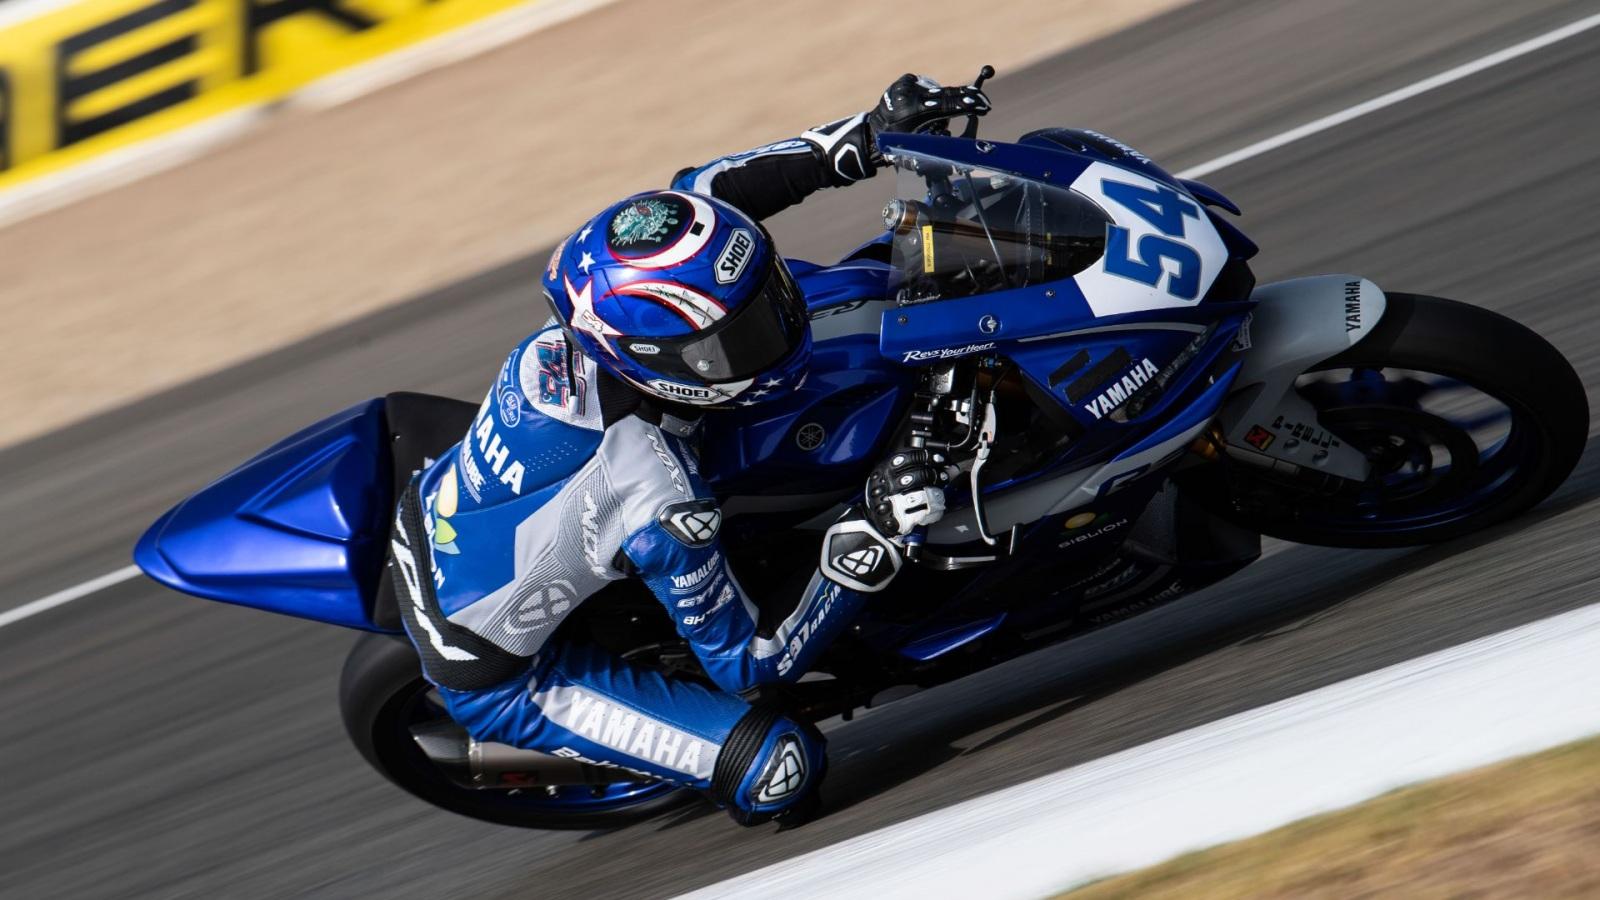 Bahattin Sofuoglu se estrena en Supersport 300 por delante de Ana Carrasco en Jerez